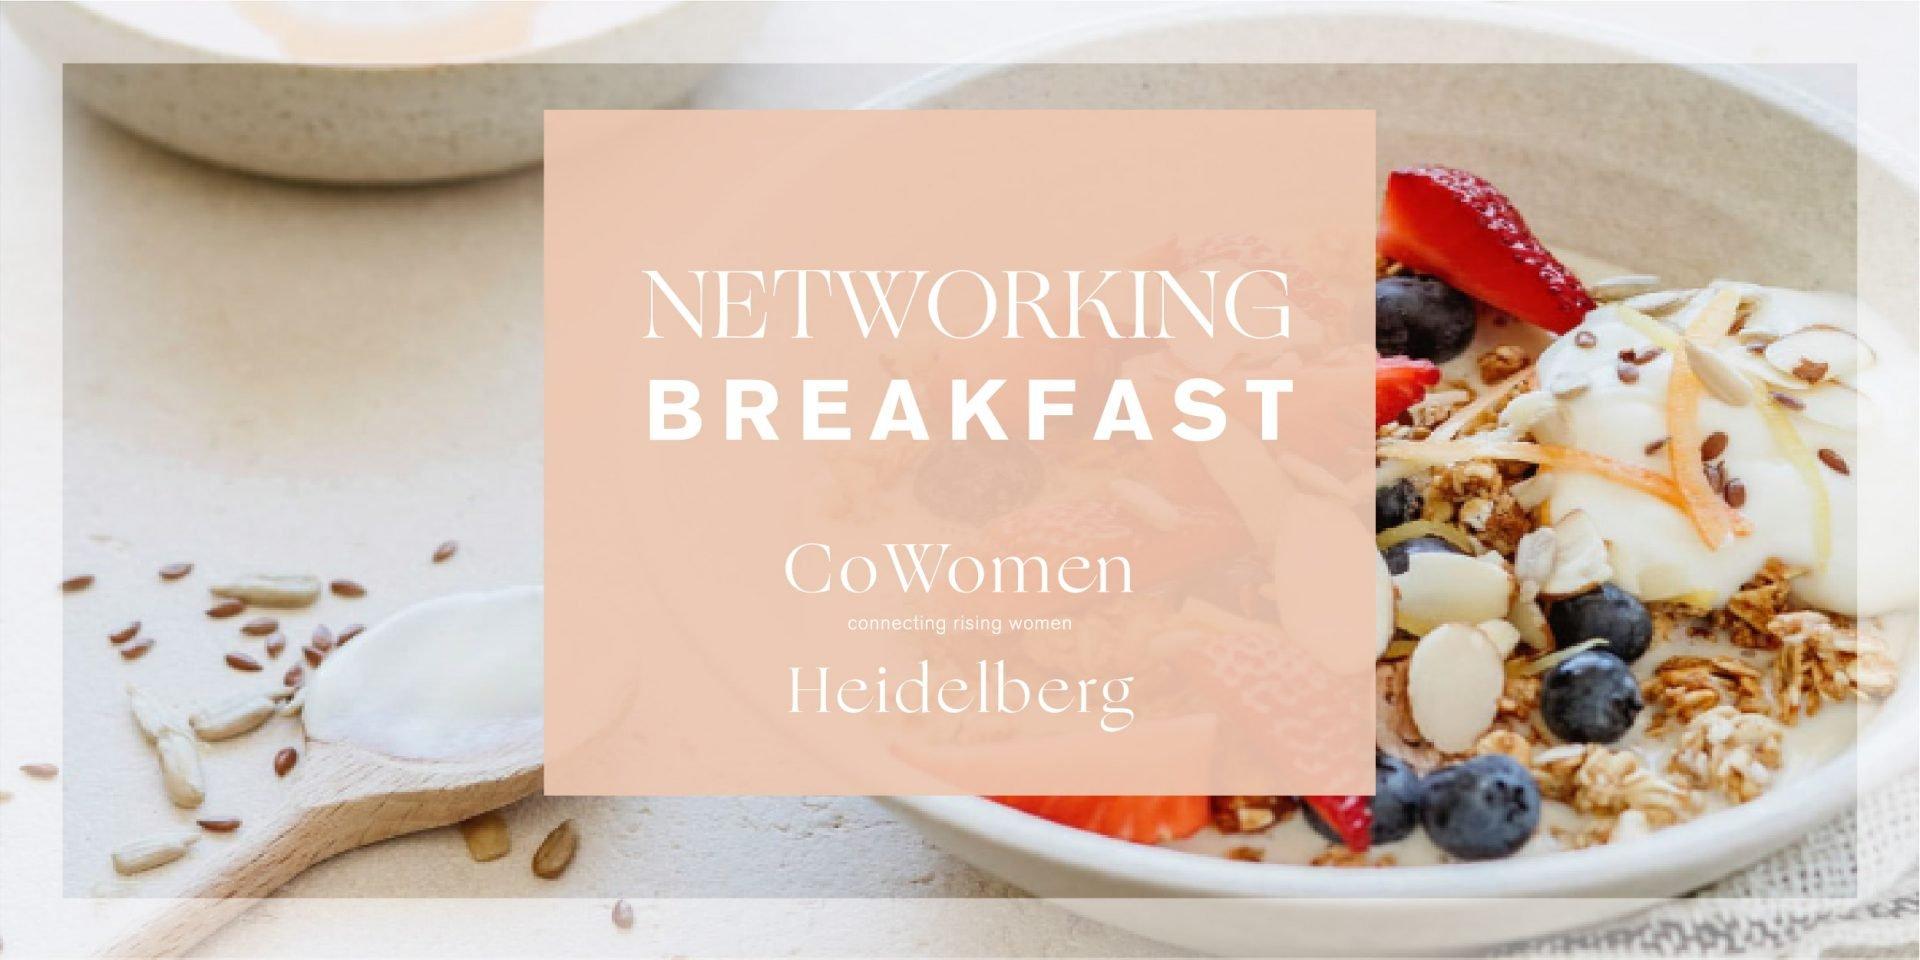 Tamplate Networking Breakfast SocialMedia Kit homepage 1200x600 1